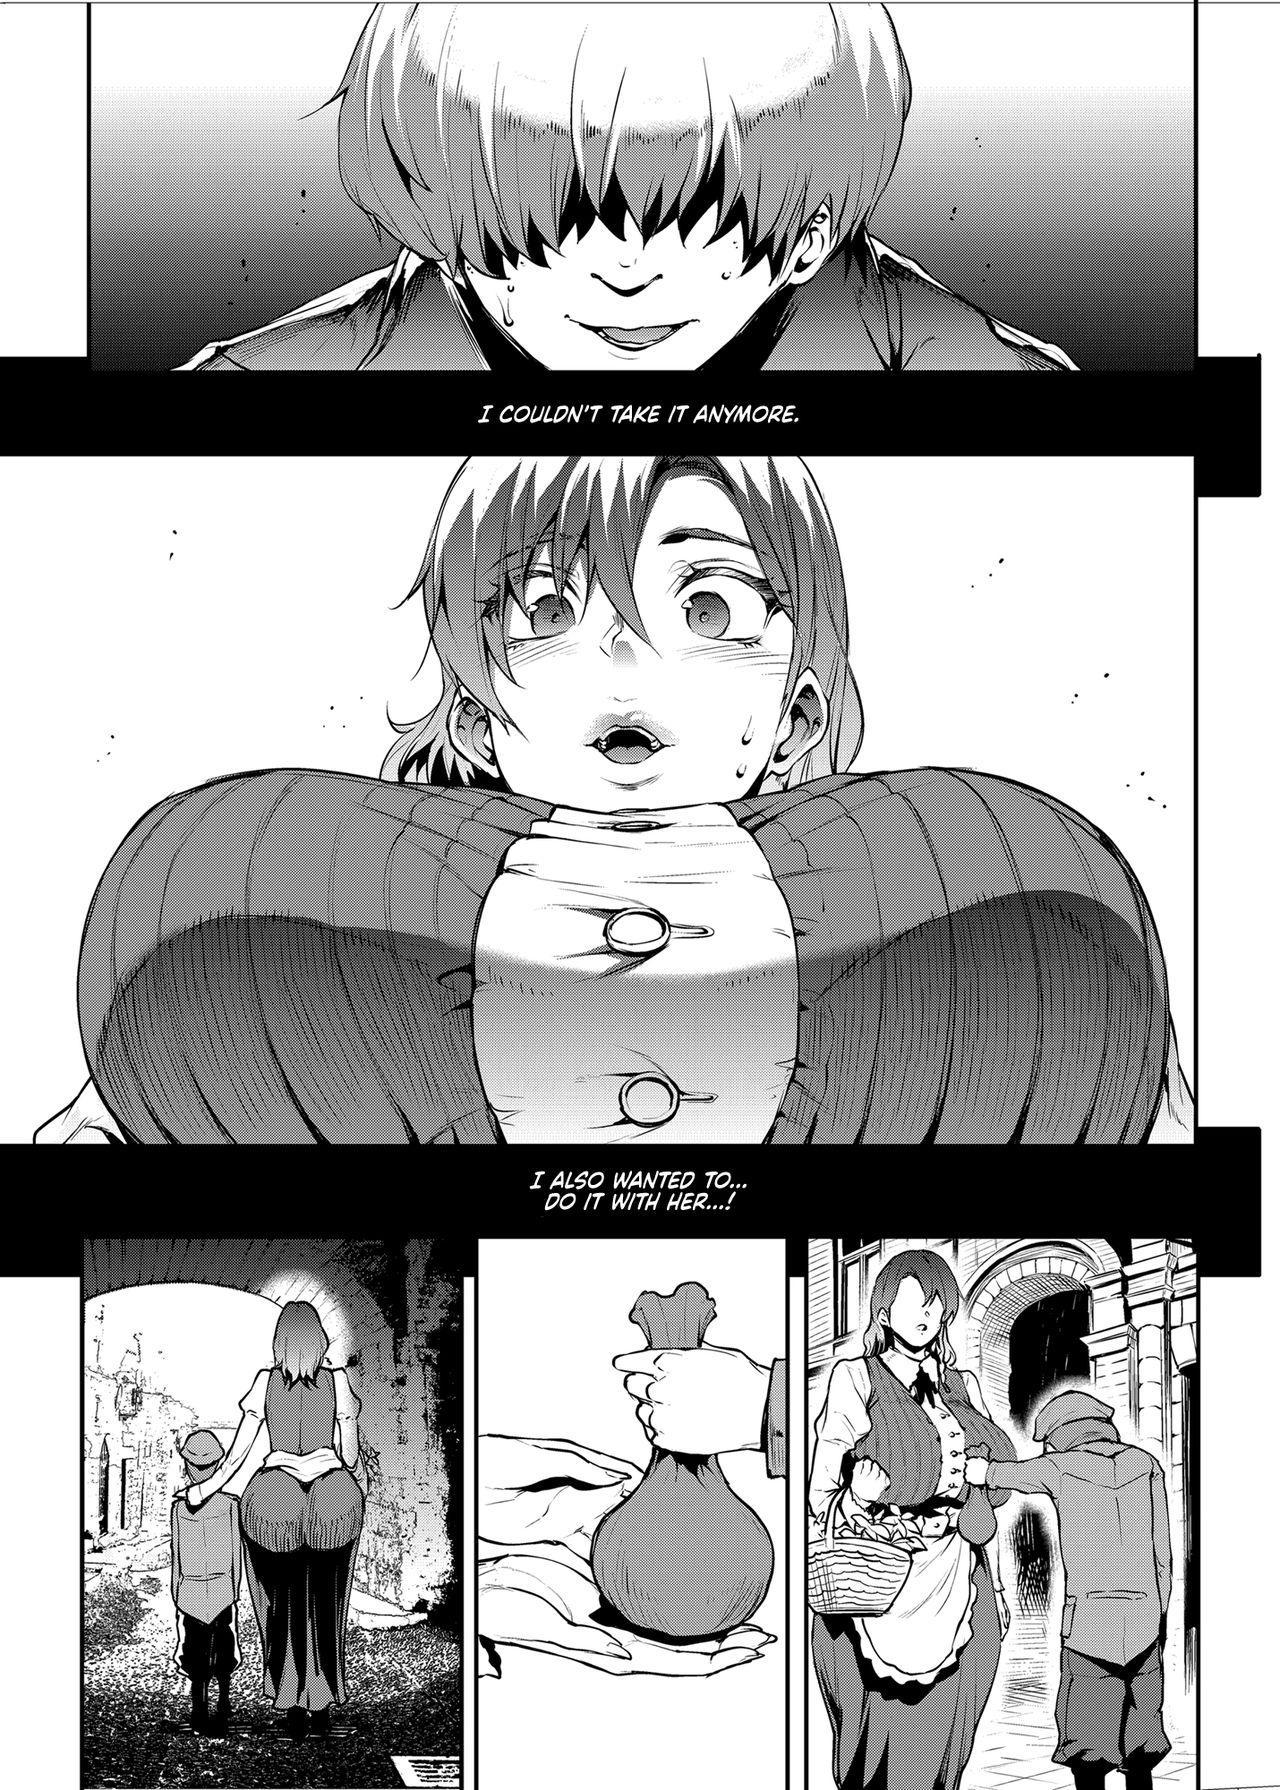 [ERECT TOUCH (Erect Sawaru)] Flower Vendor ~Hanauri Onee-san ni Yasashiku Fudeoroshi~ | Flower Vendor ~Gently Losing My Virginity To Miss Flower Vendor~ [English] [RedLantern] 16